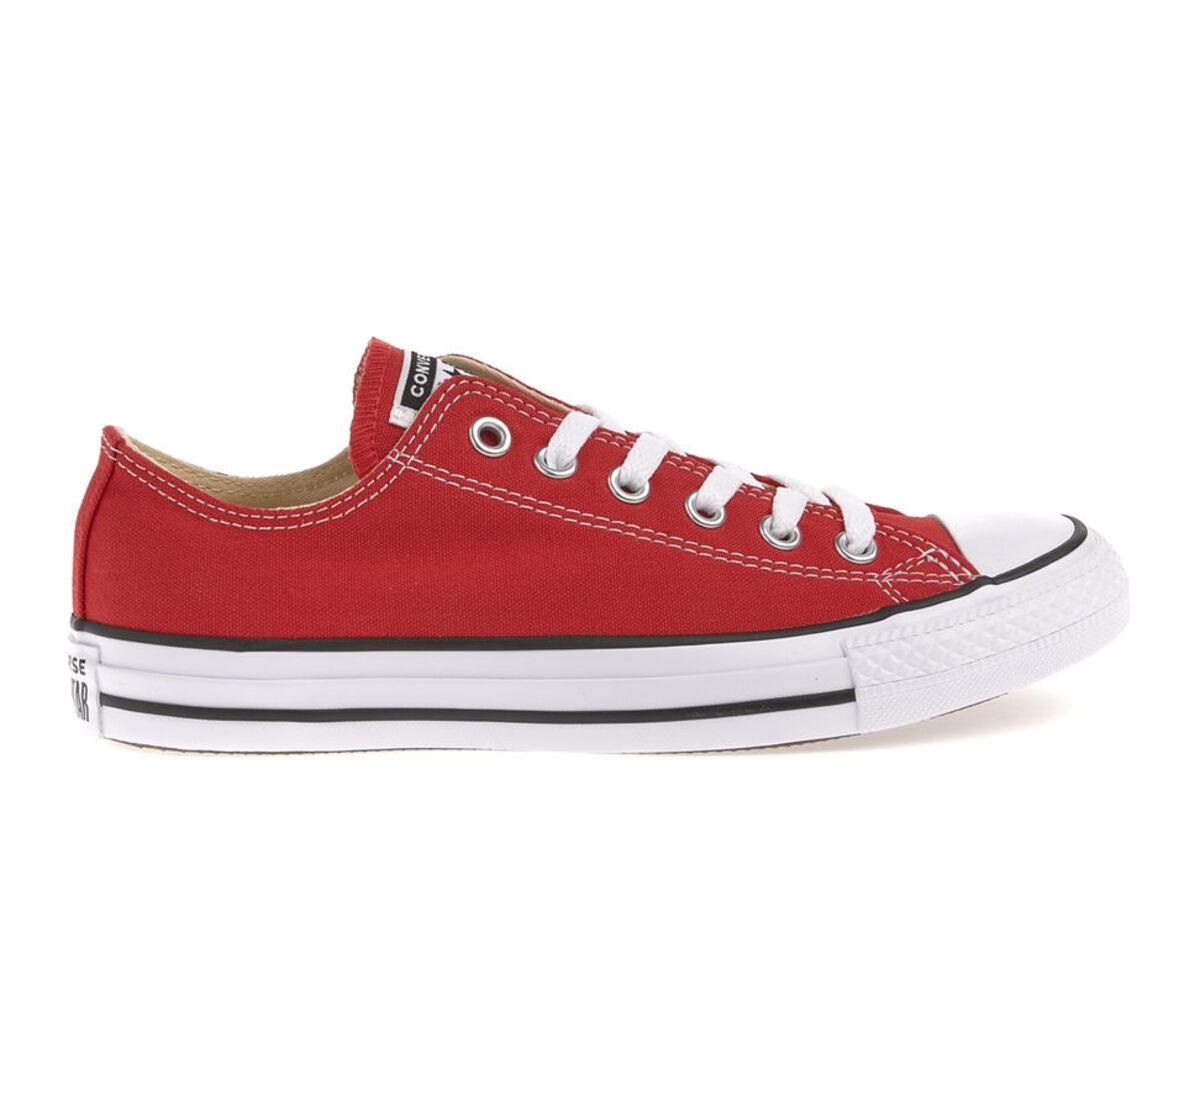 Bild 3 von Converse Sneaker - CHUCK TAYLOR ALL STAR OX